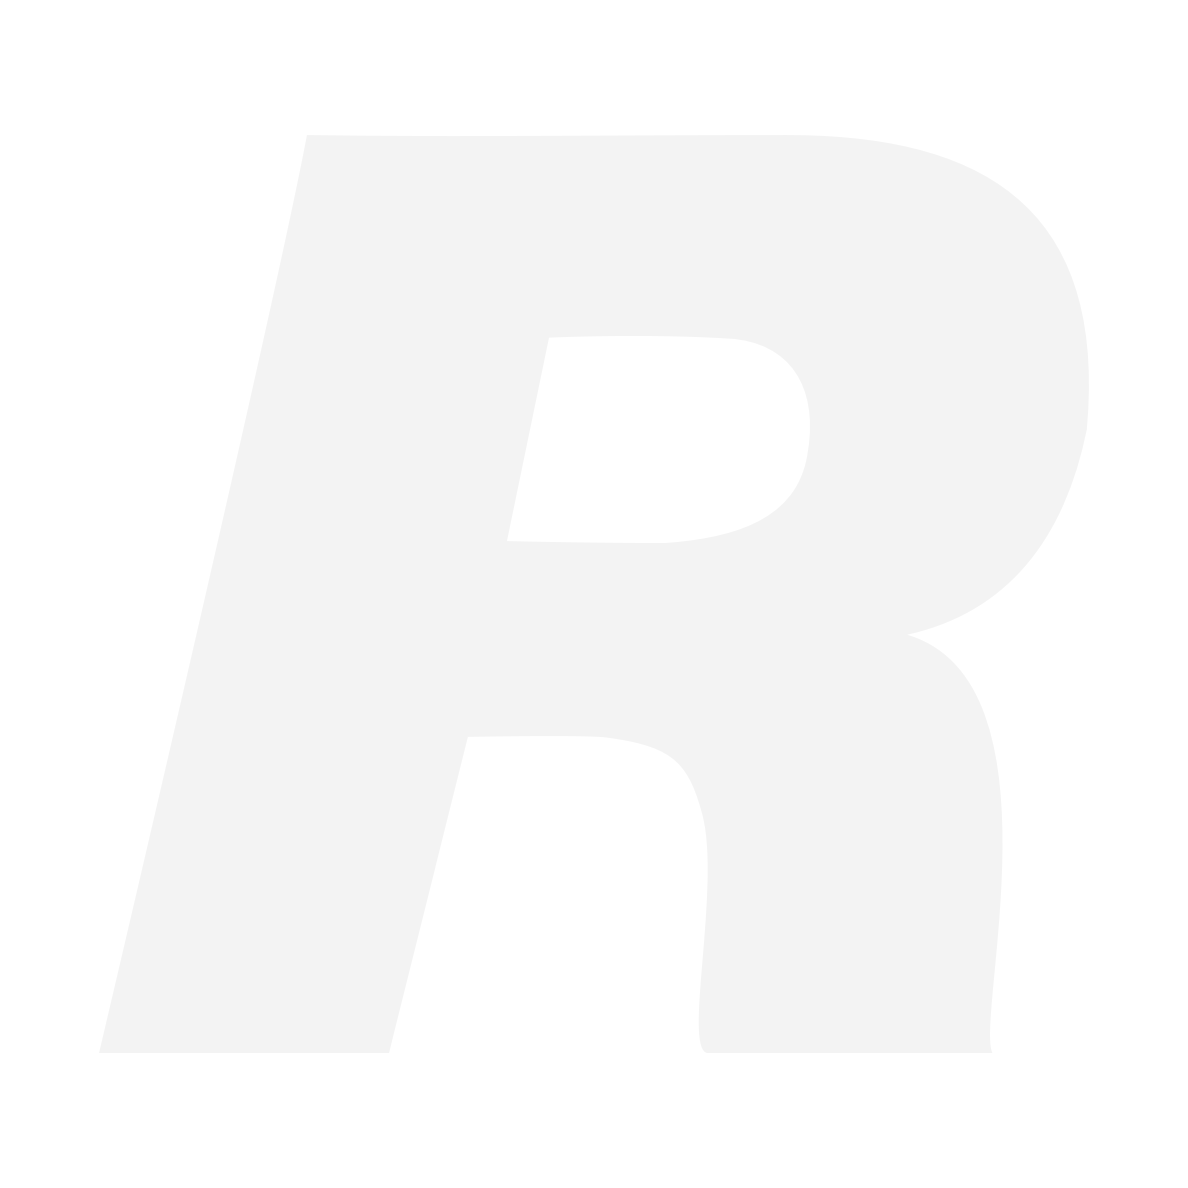 Köp Sony A7R Mark III, byt in din gamla Sony A7